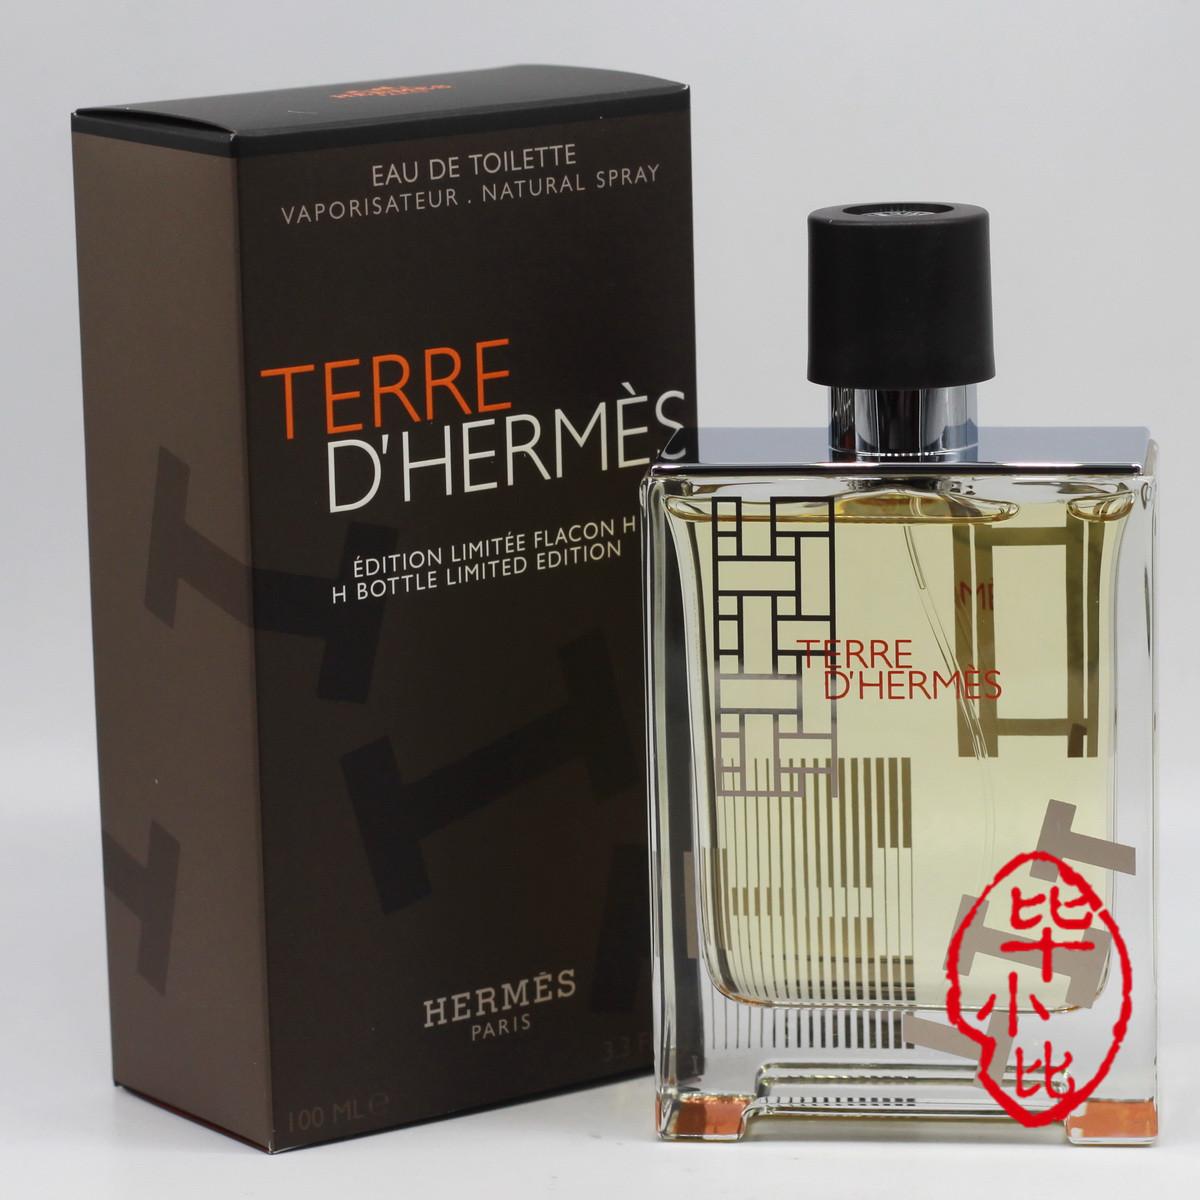 Dhermes104 Hermes Terre D Flacon H 2013 Limited 100 Ml Dhermes 2016100ml